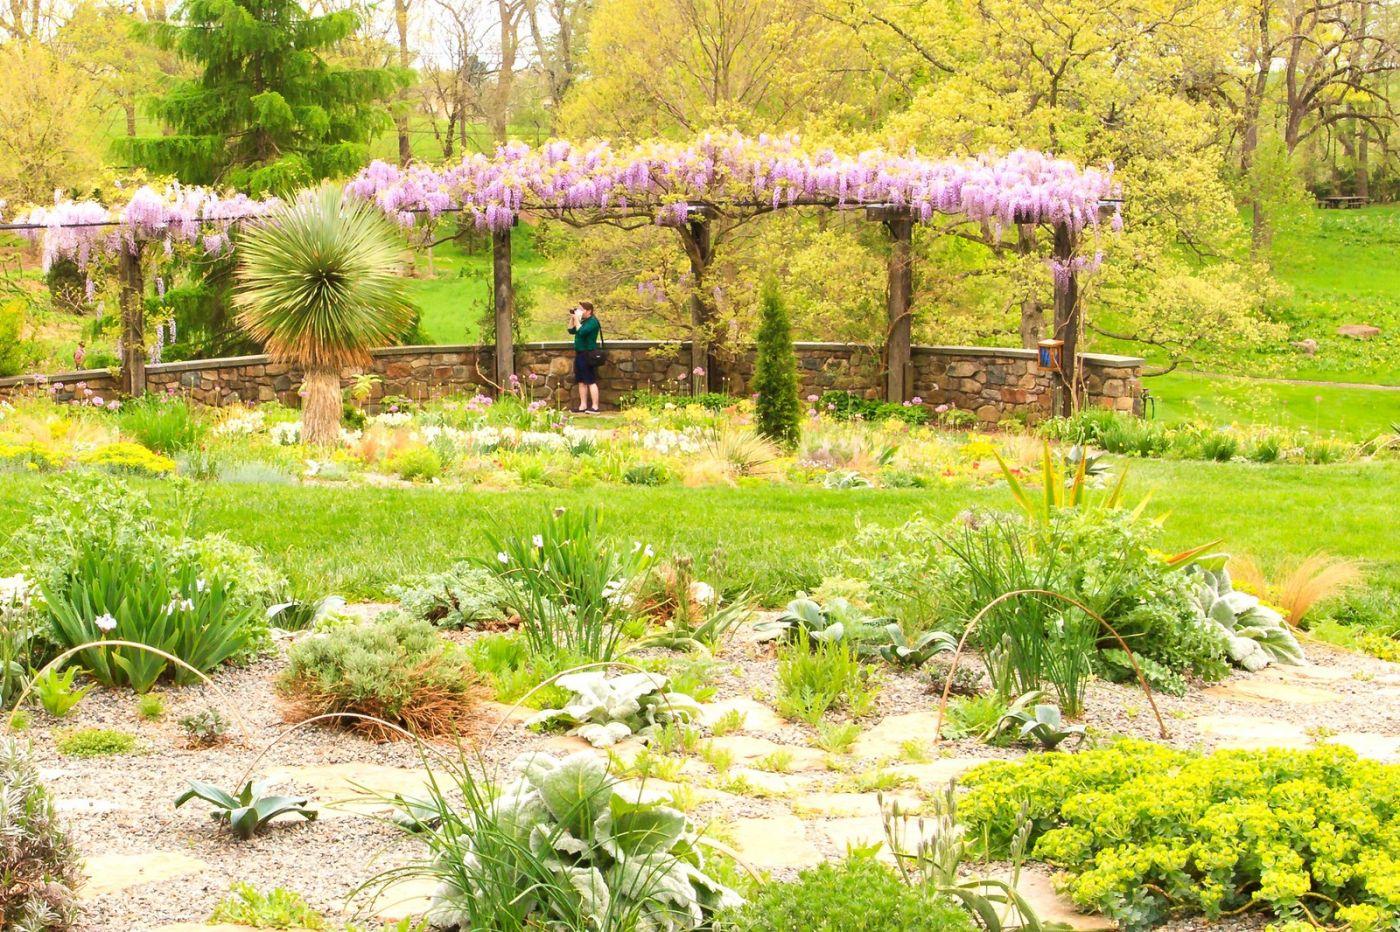 Chanticleer花园,那年盛开的紫藤花_图1-26